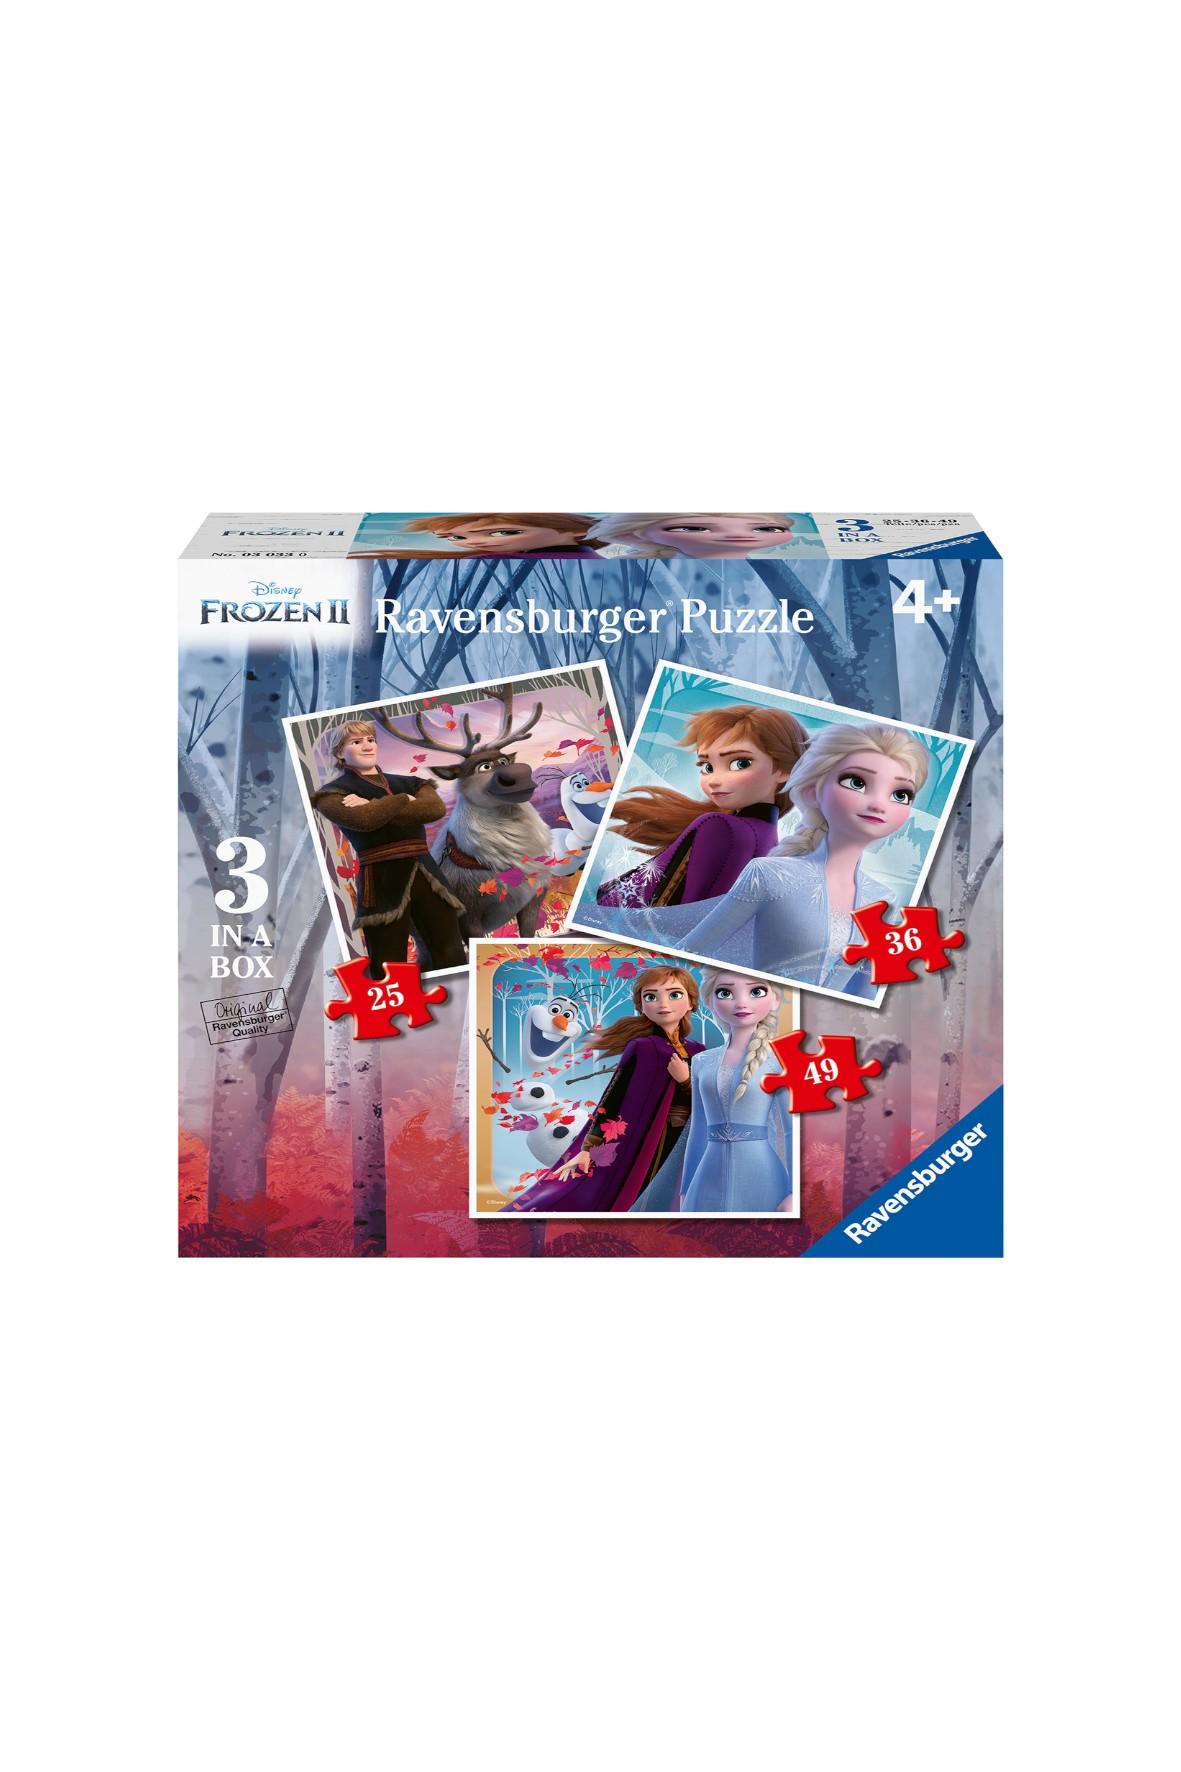 Puzzle Frozen 2 - 3W1 25/36/49 elementów 4+